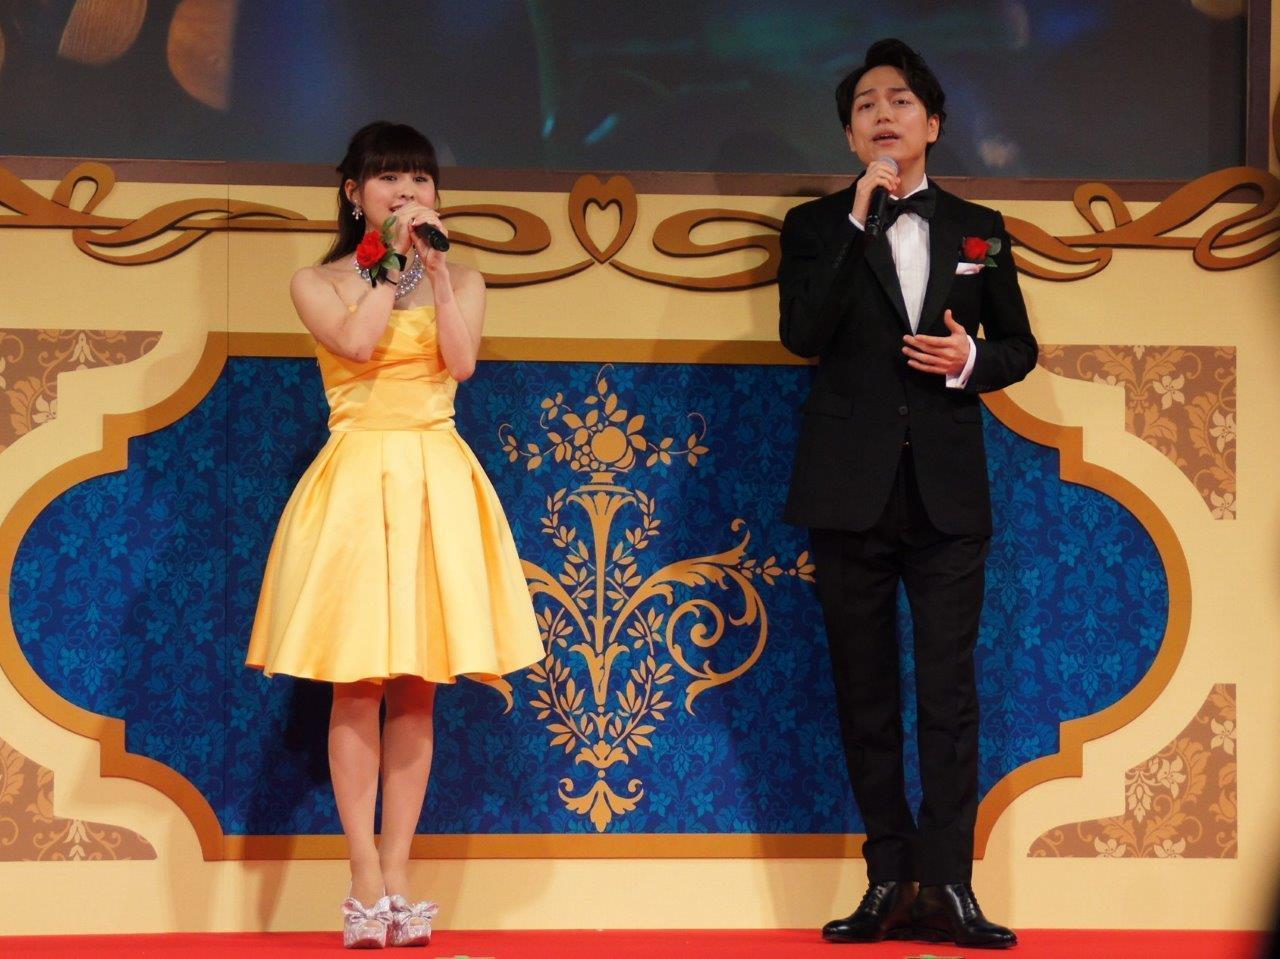 http://news.yoshimoto.co.jp/20170131150333-b5d1dc648130bdeea0fcf3255f2053b6bd8745fa.jpg